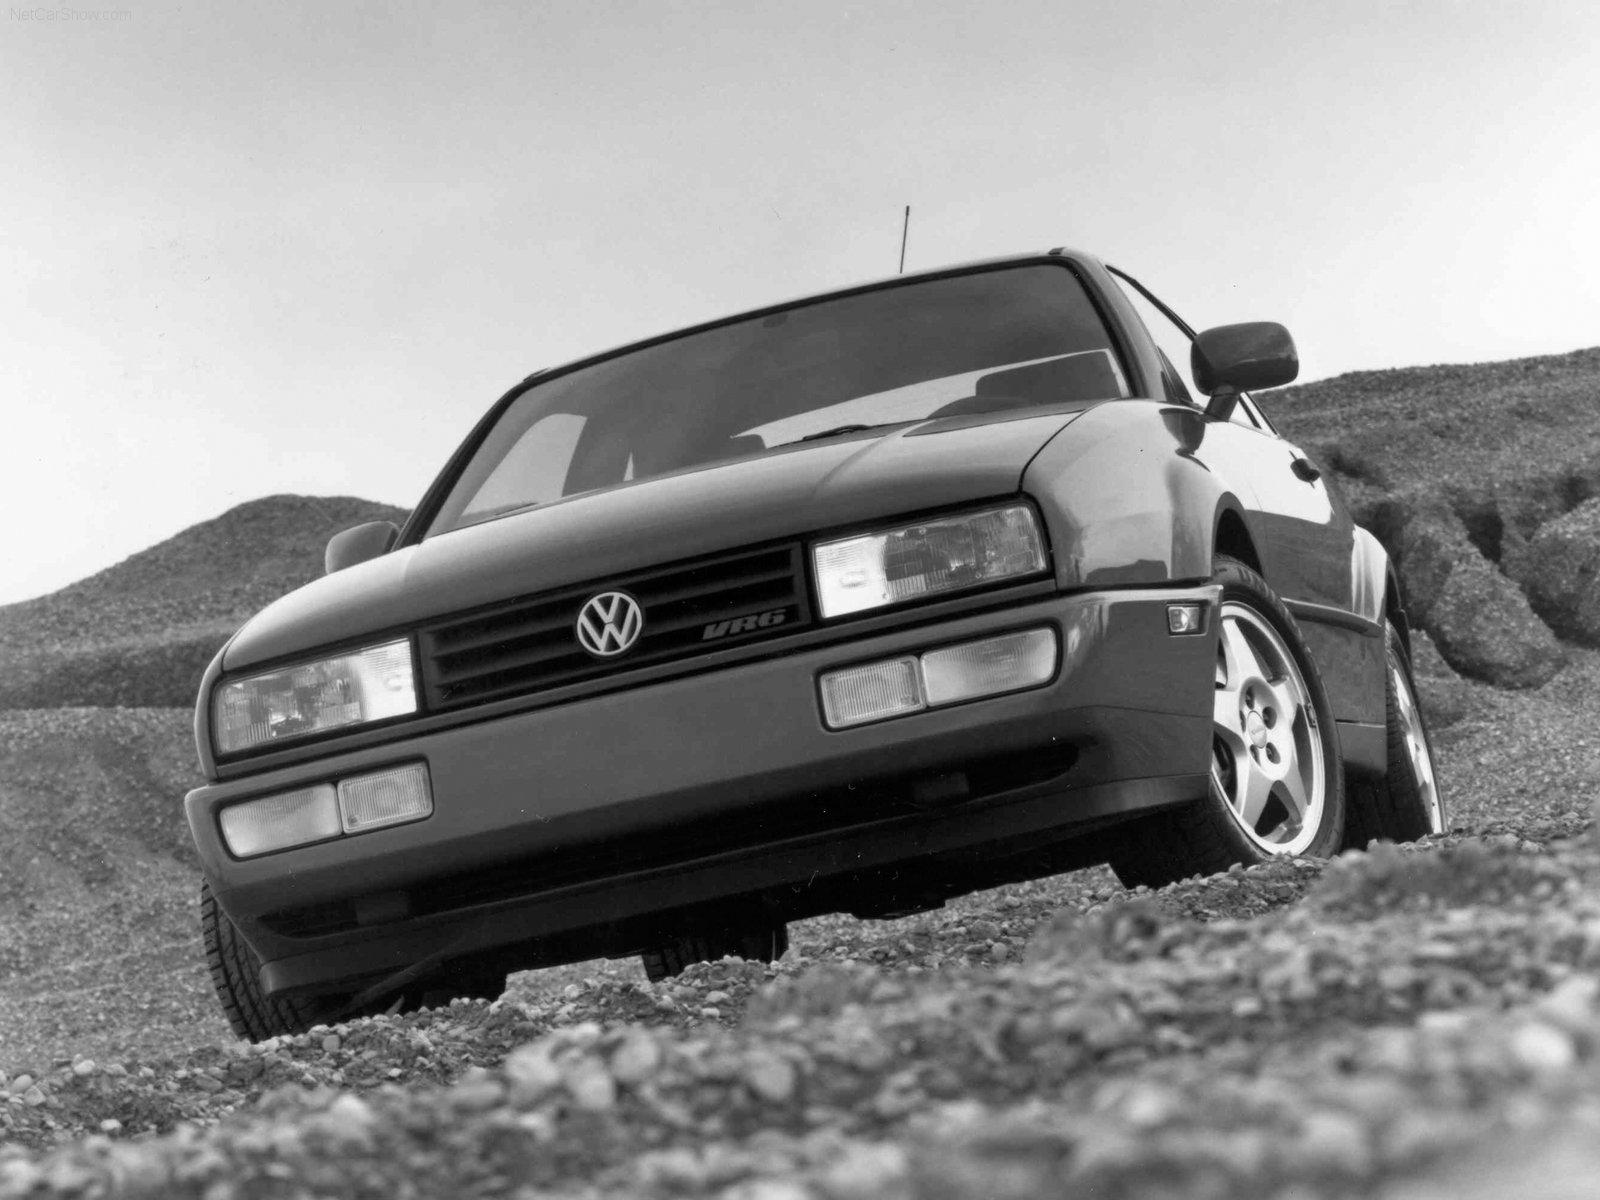 Volkswagen Corrado Background